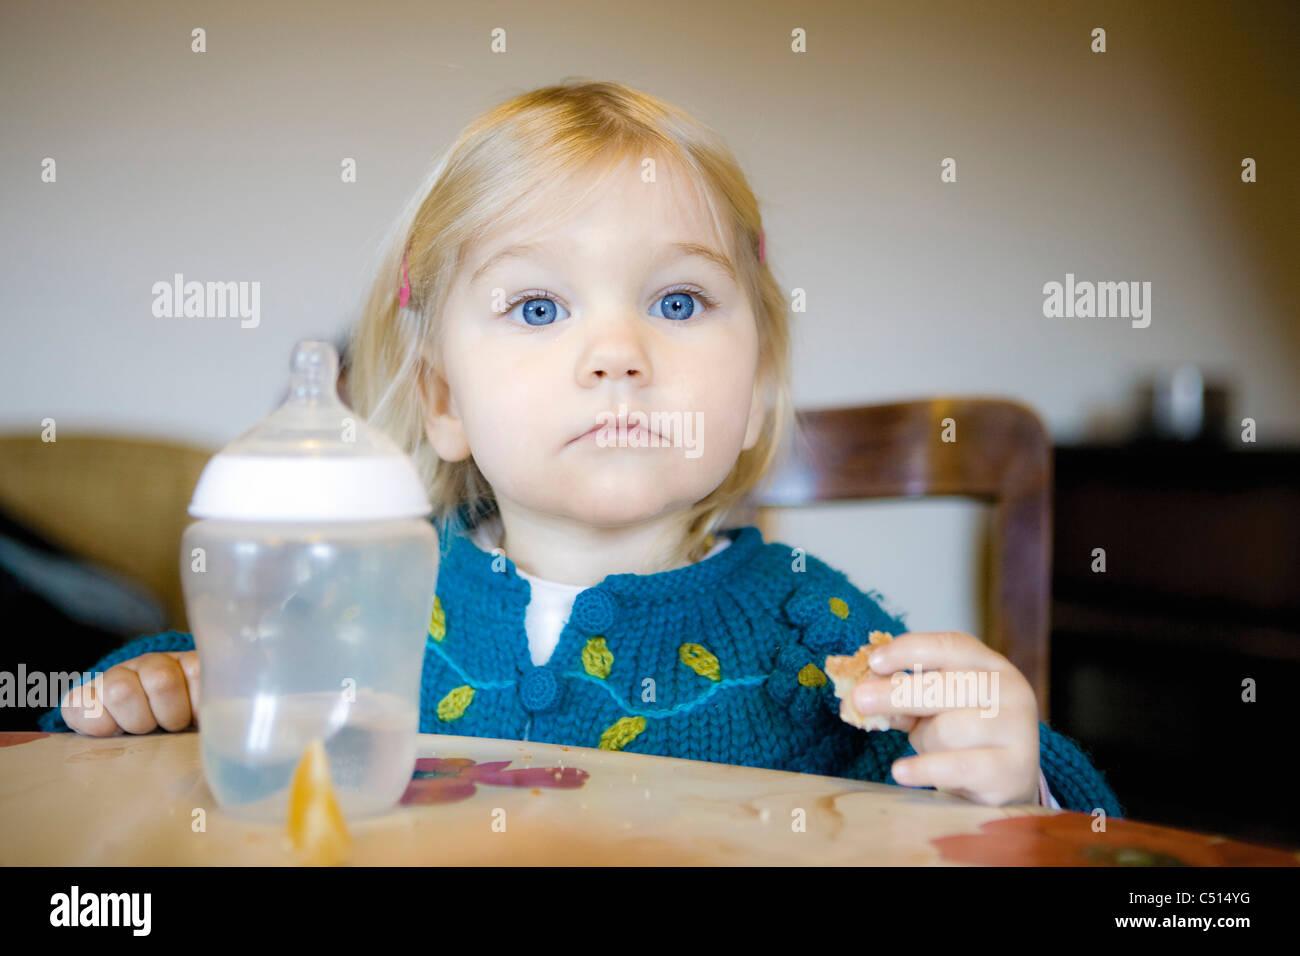 Baby Girl eating snack, portrait Banque D'Images